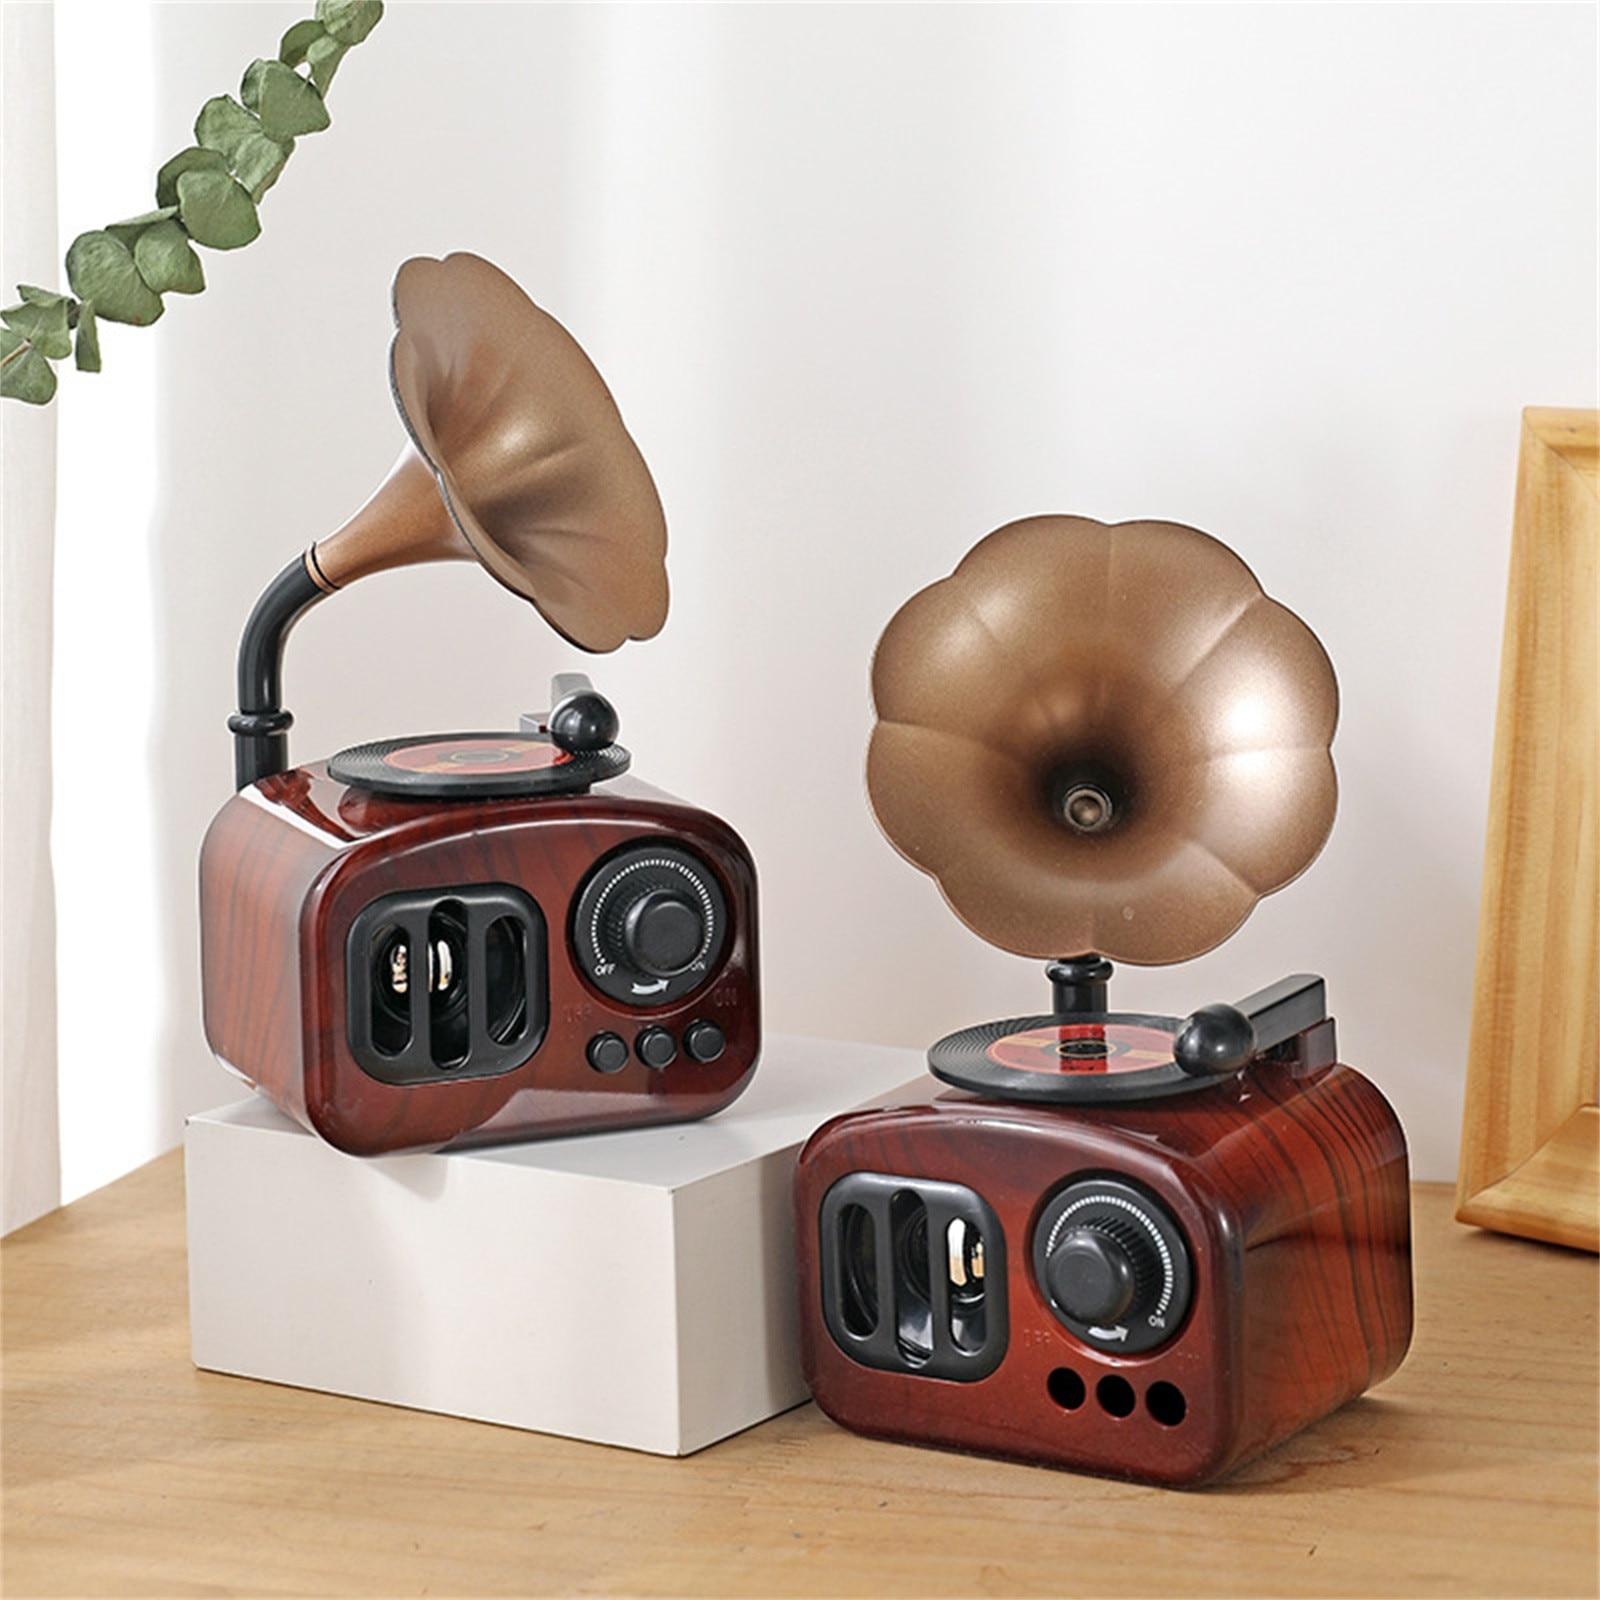 Retro Music Box Fashionable Home Decoration  Mini Gramophone Nostalgic Style Mechanical Creative Birthday Gift Decoration